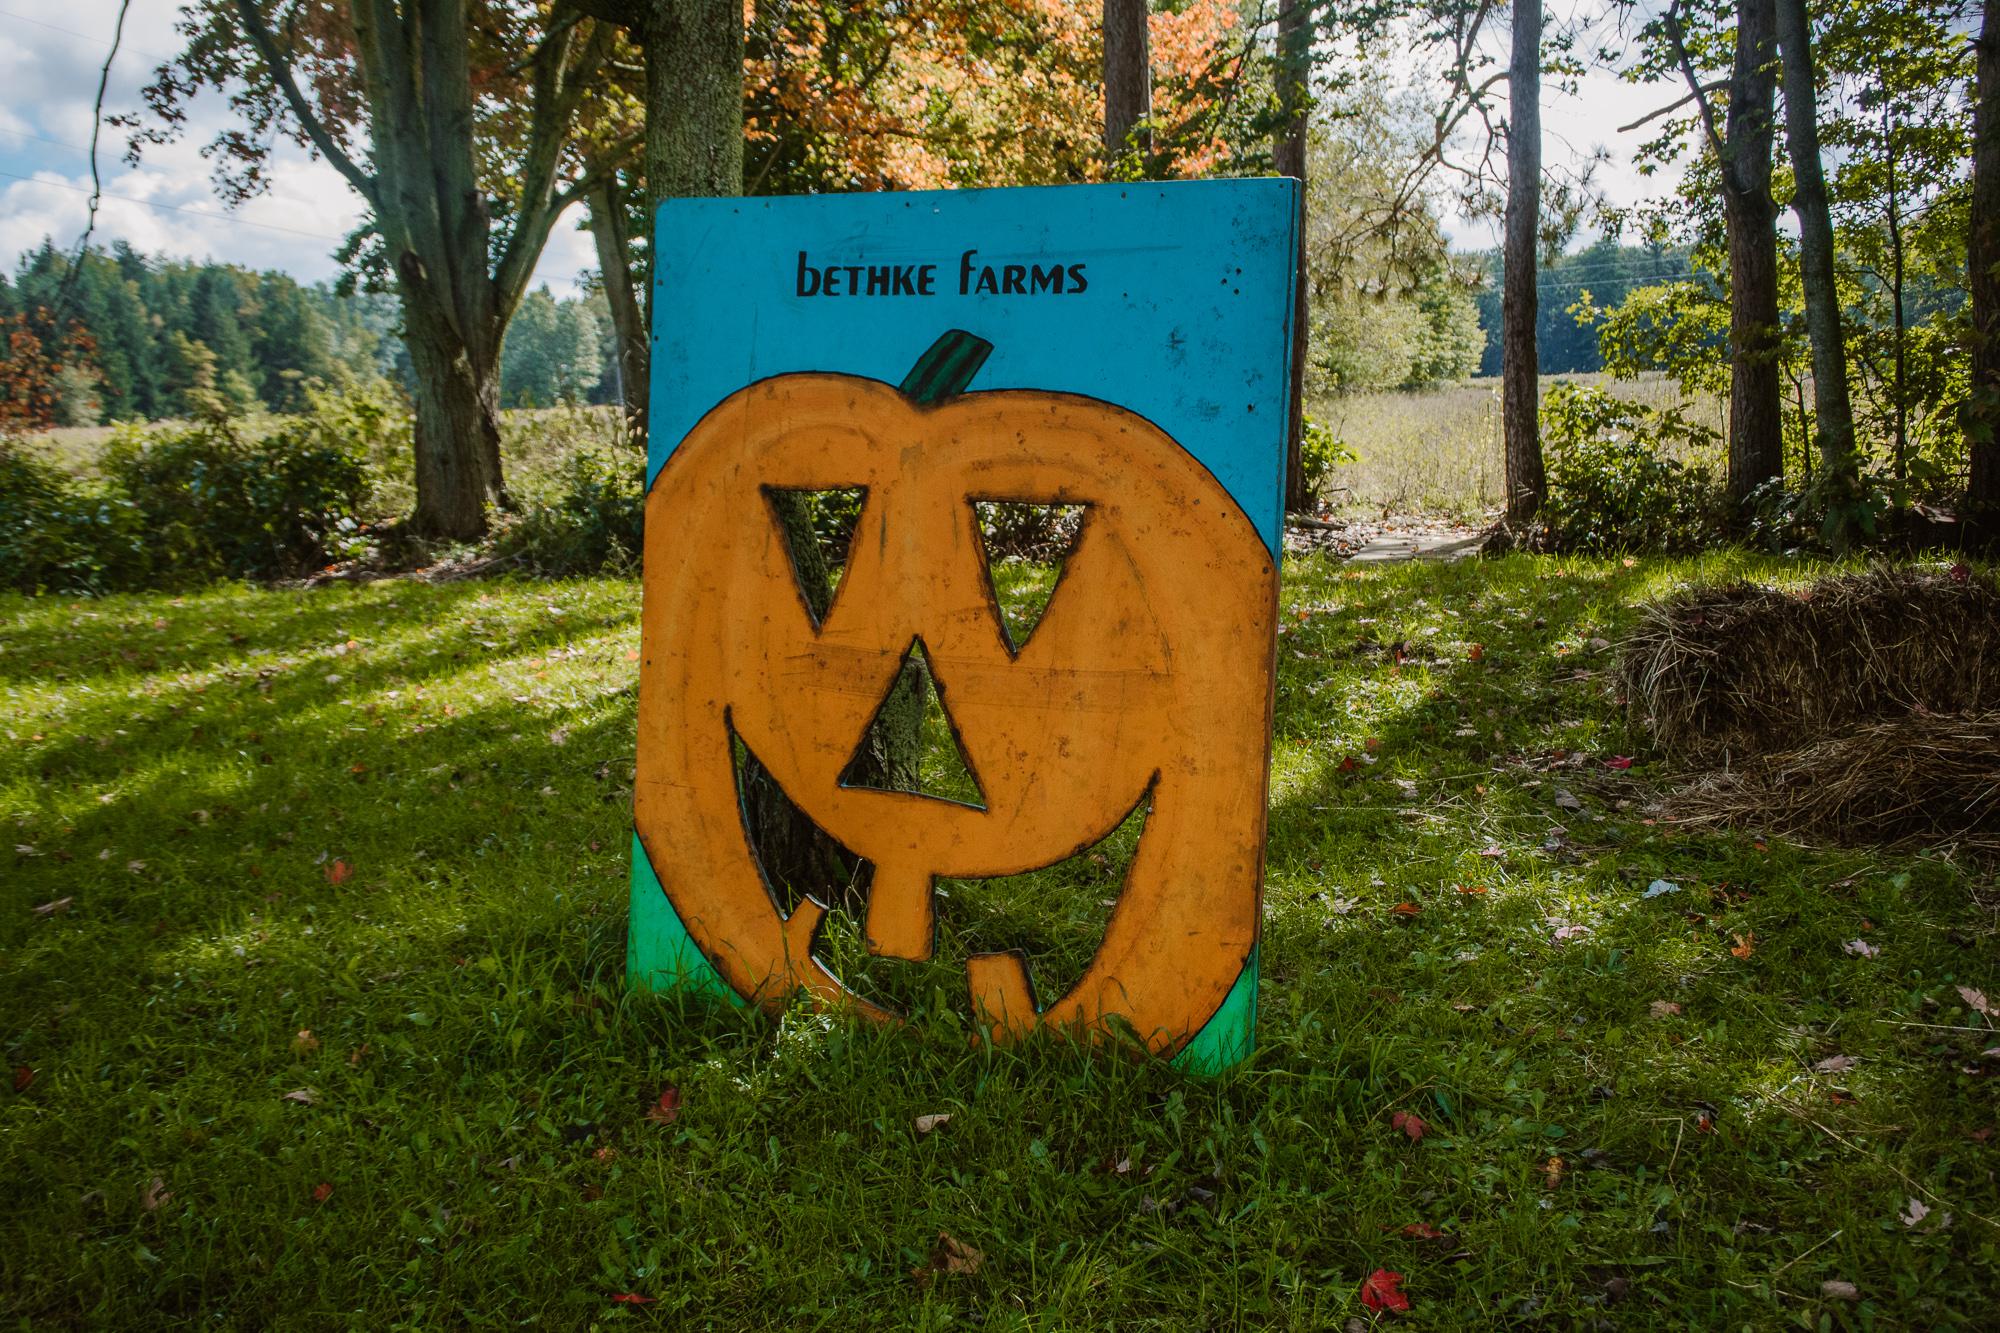 bethke-farms-pumpkin-patch-grand-haven-michigan (18).jpg